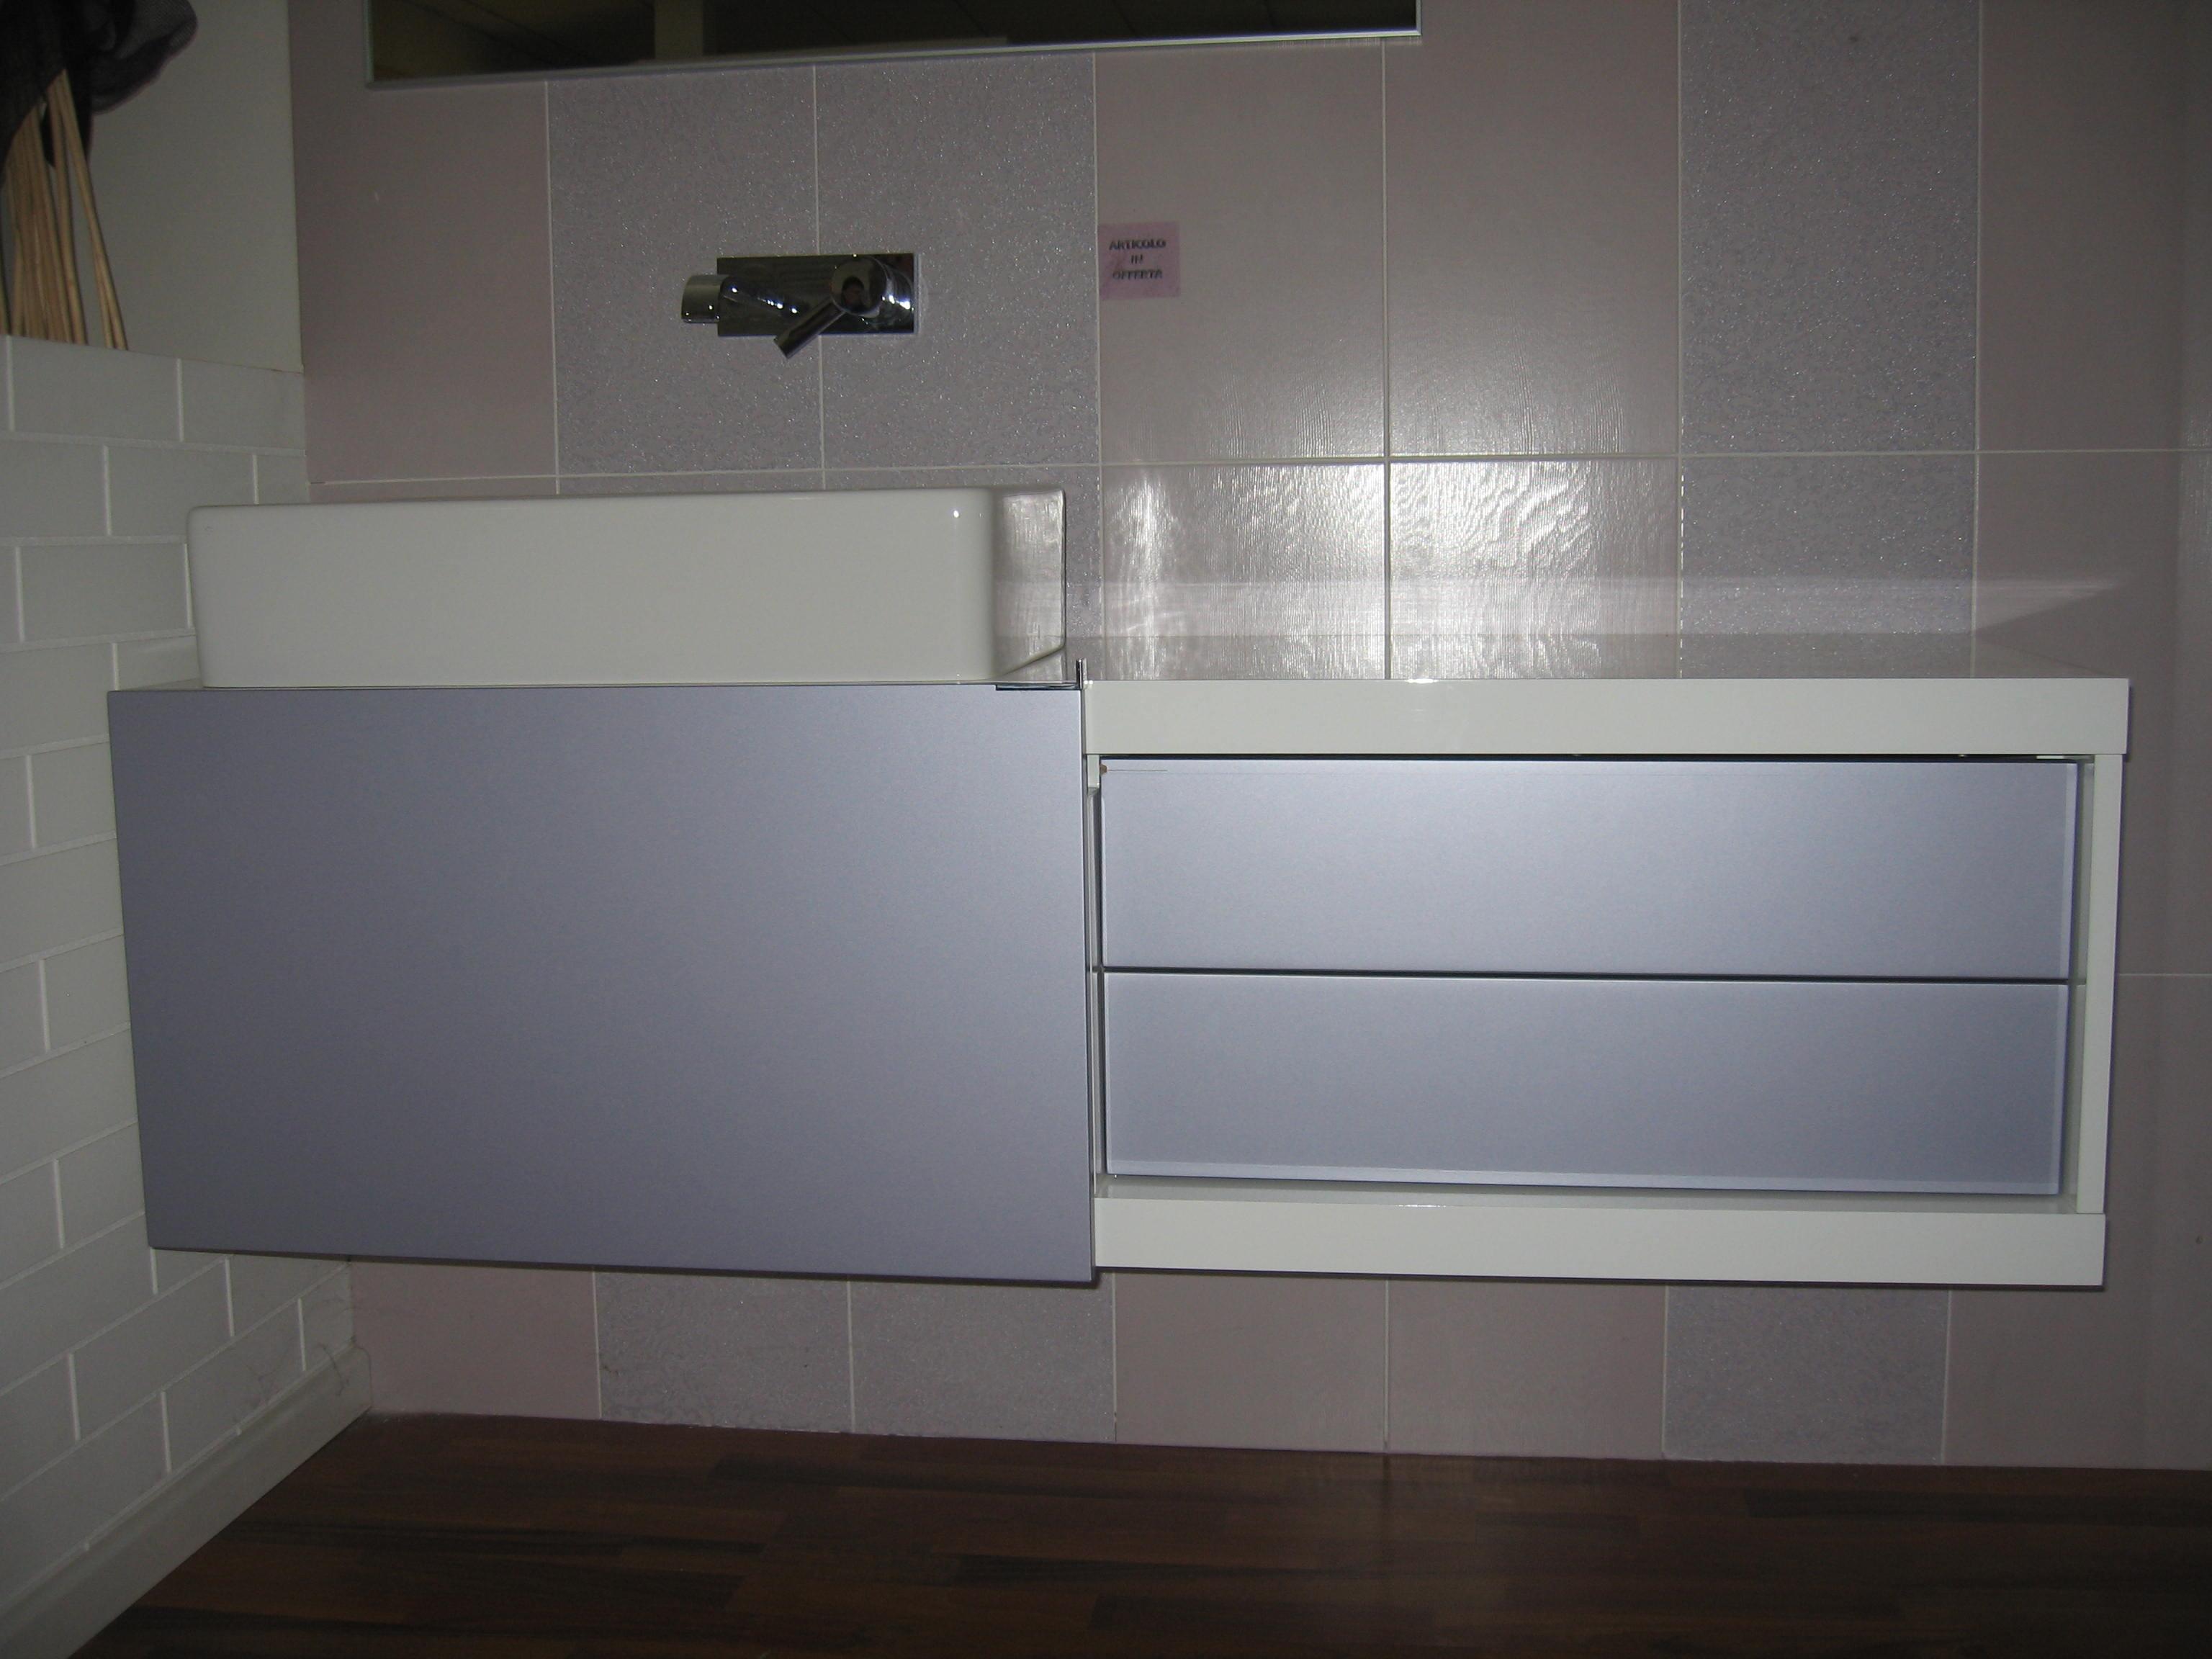 Ingresso mobili sbalzati a parete for Vendita mobili modena